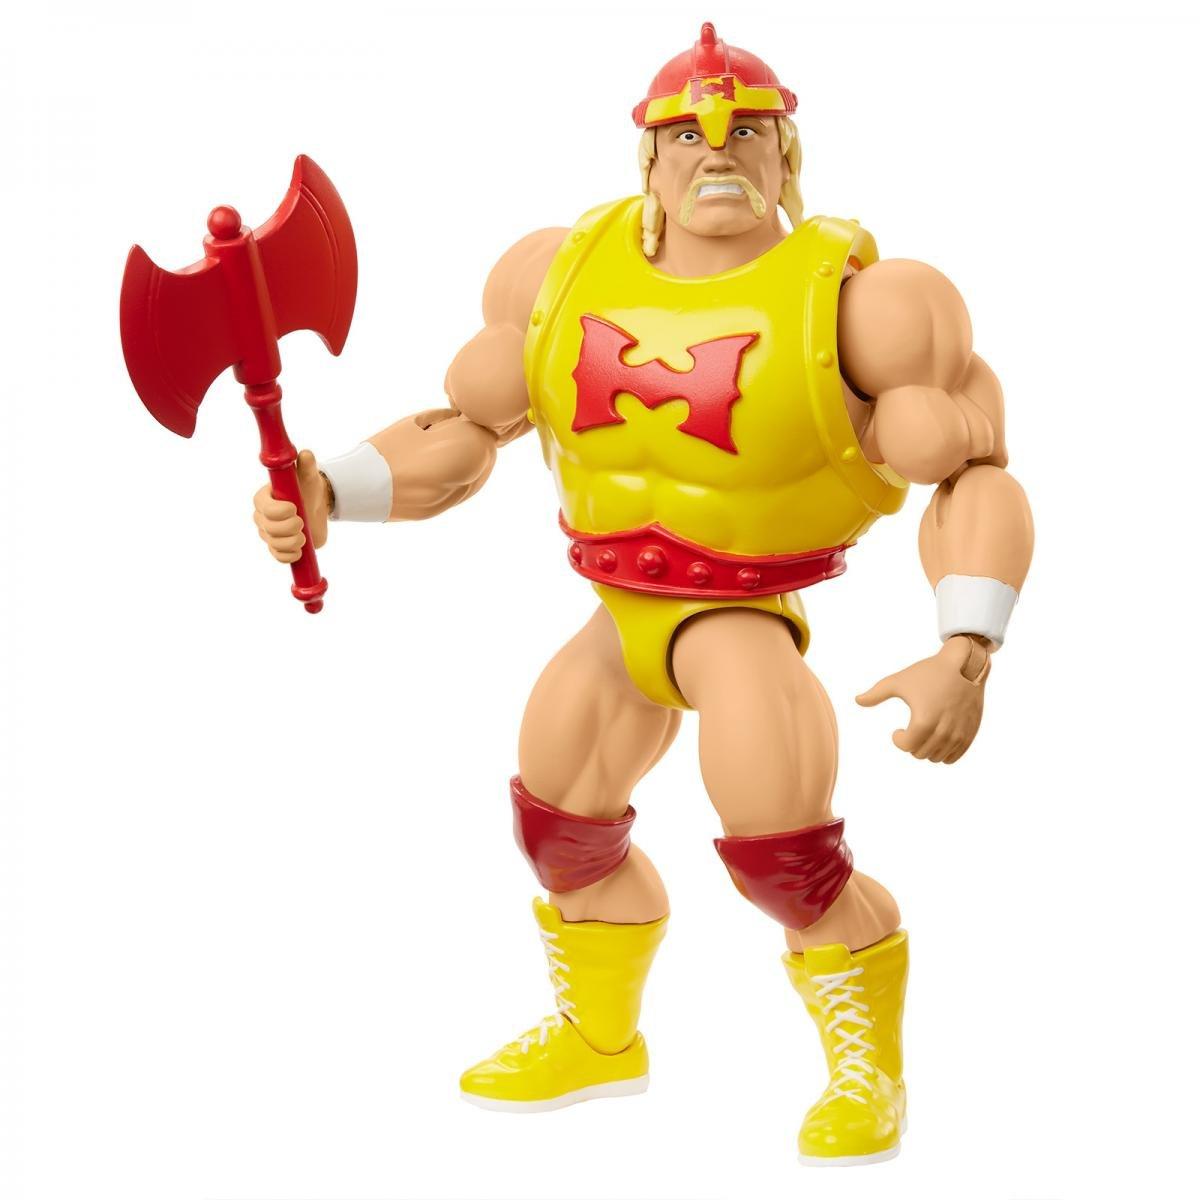 Hulk Hogan masters of the WWE universe